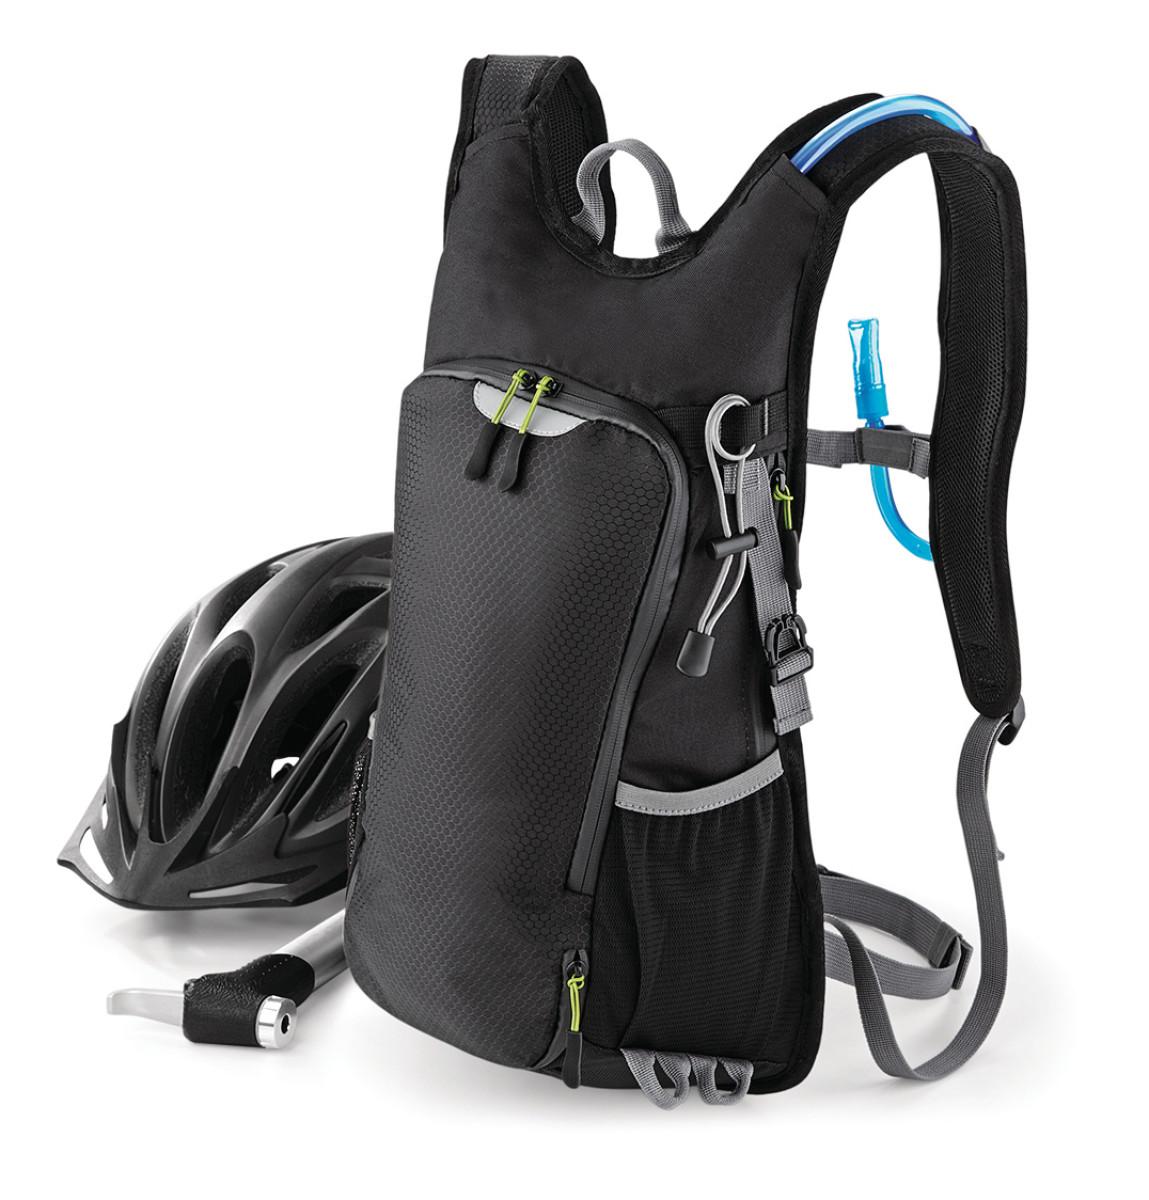 Quadra Apex Hydration Pack